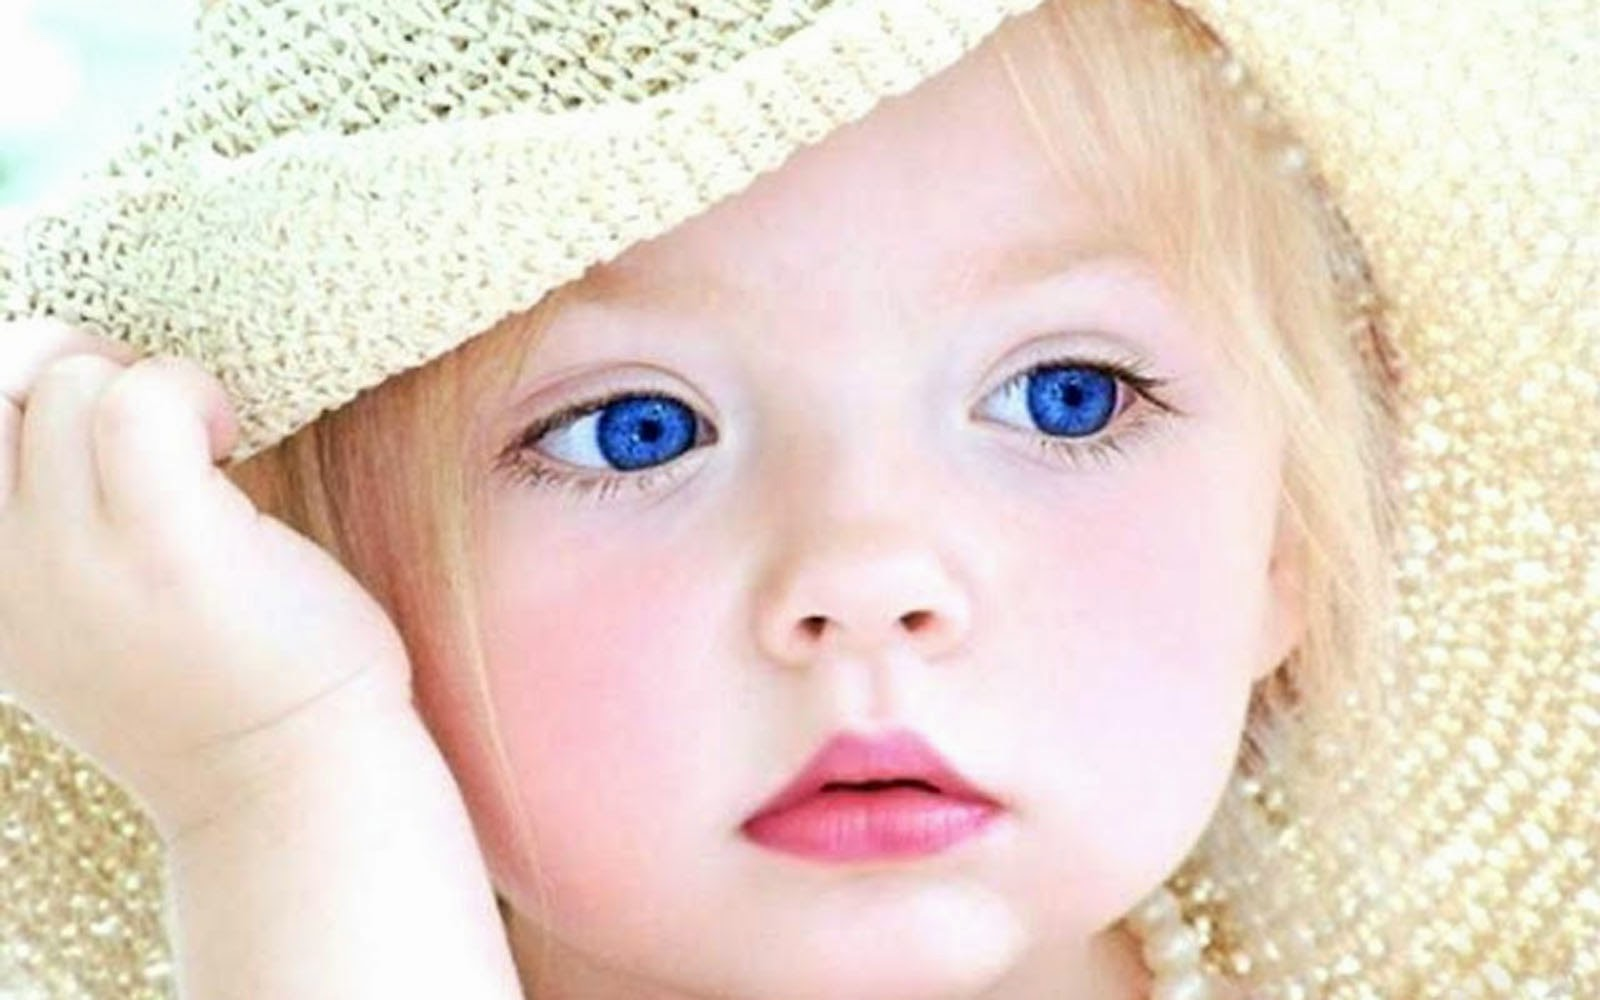 Beautiful Love Baby Wallpaper : Beautiful Wallpapers For Desktop: HD cute Baby wallpapers